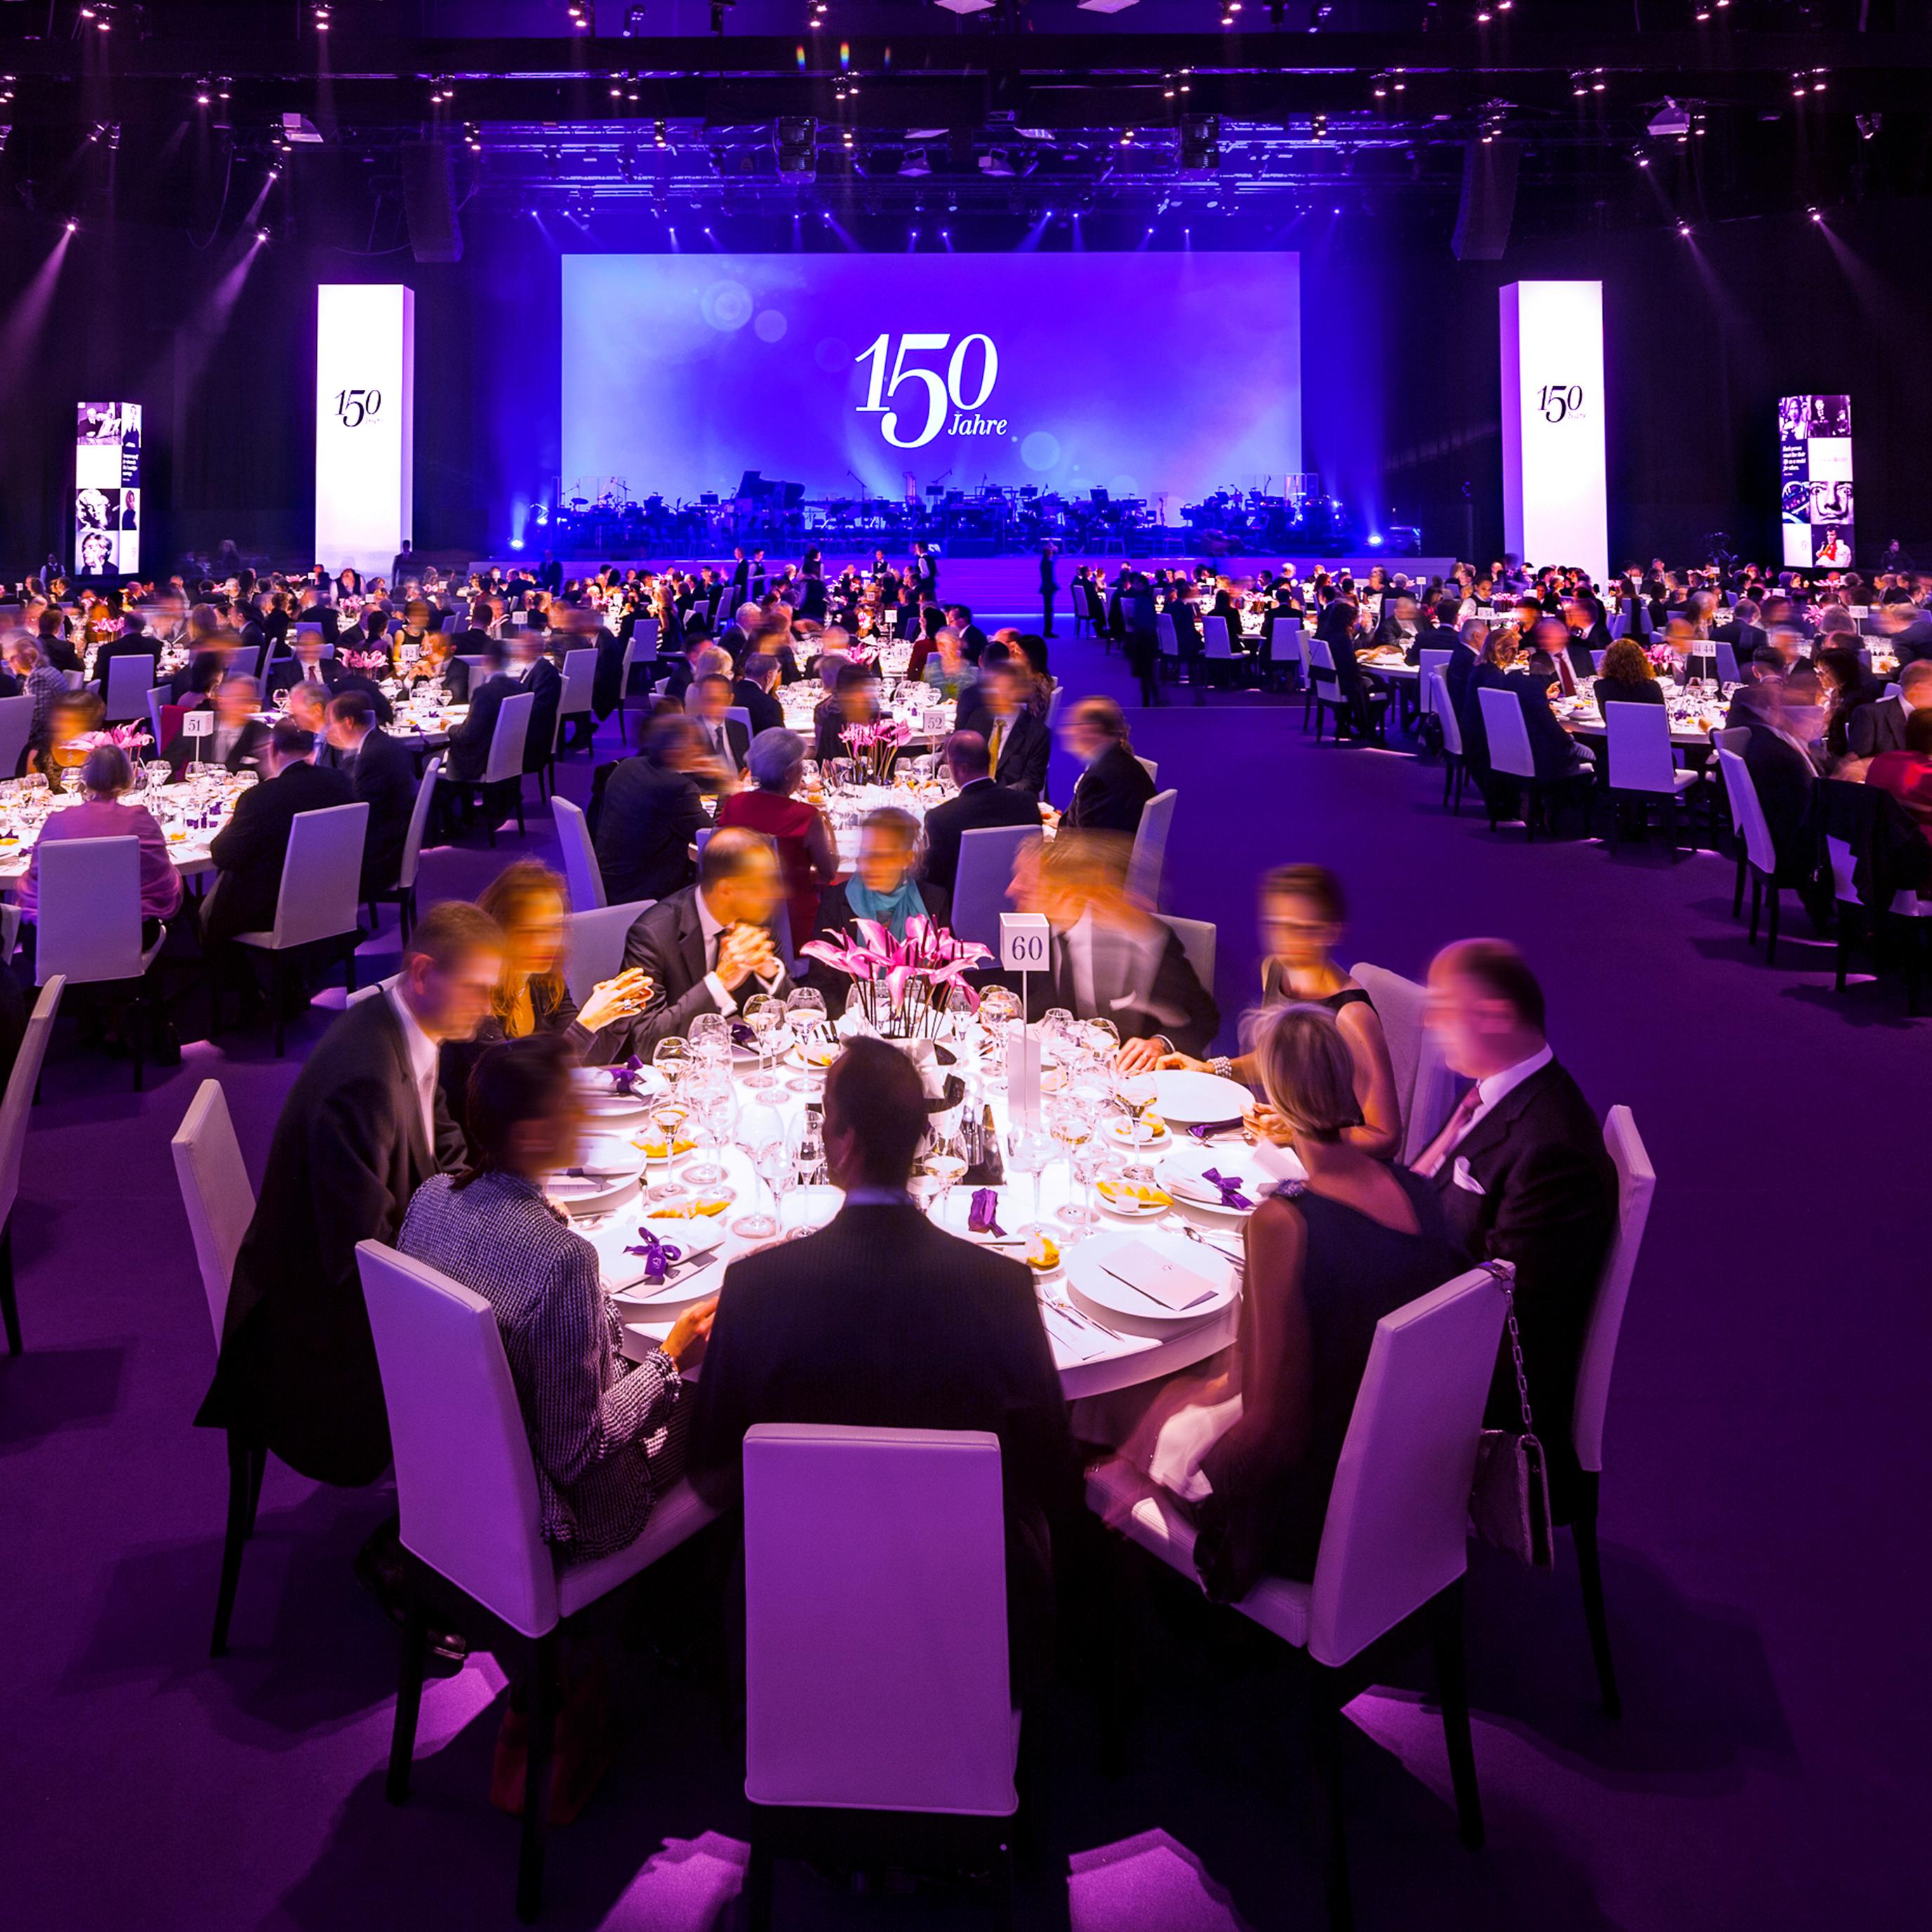 hauser & partner Event Corporate Event